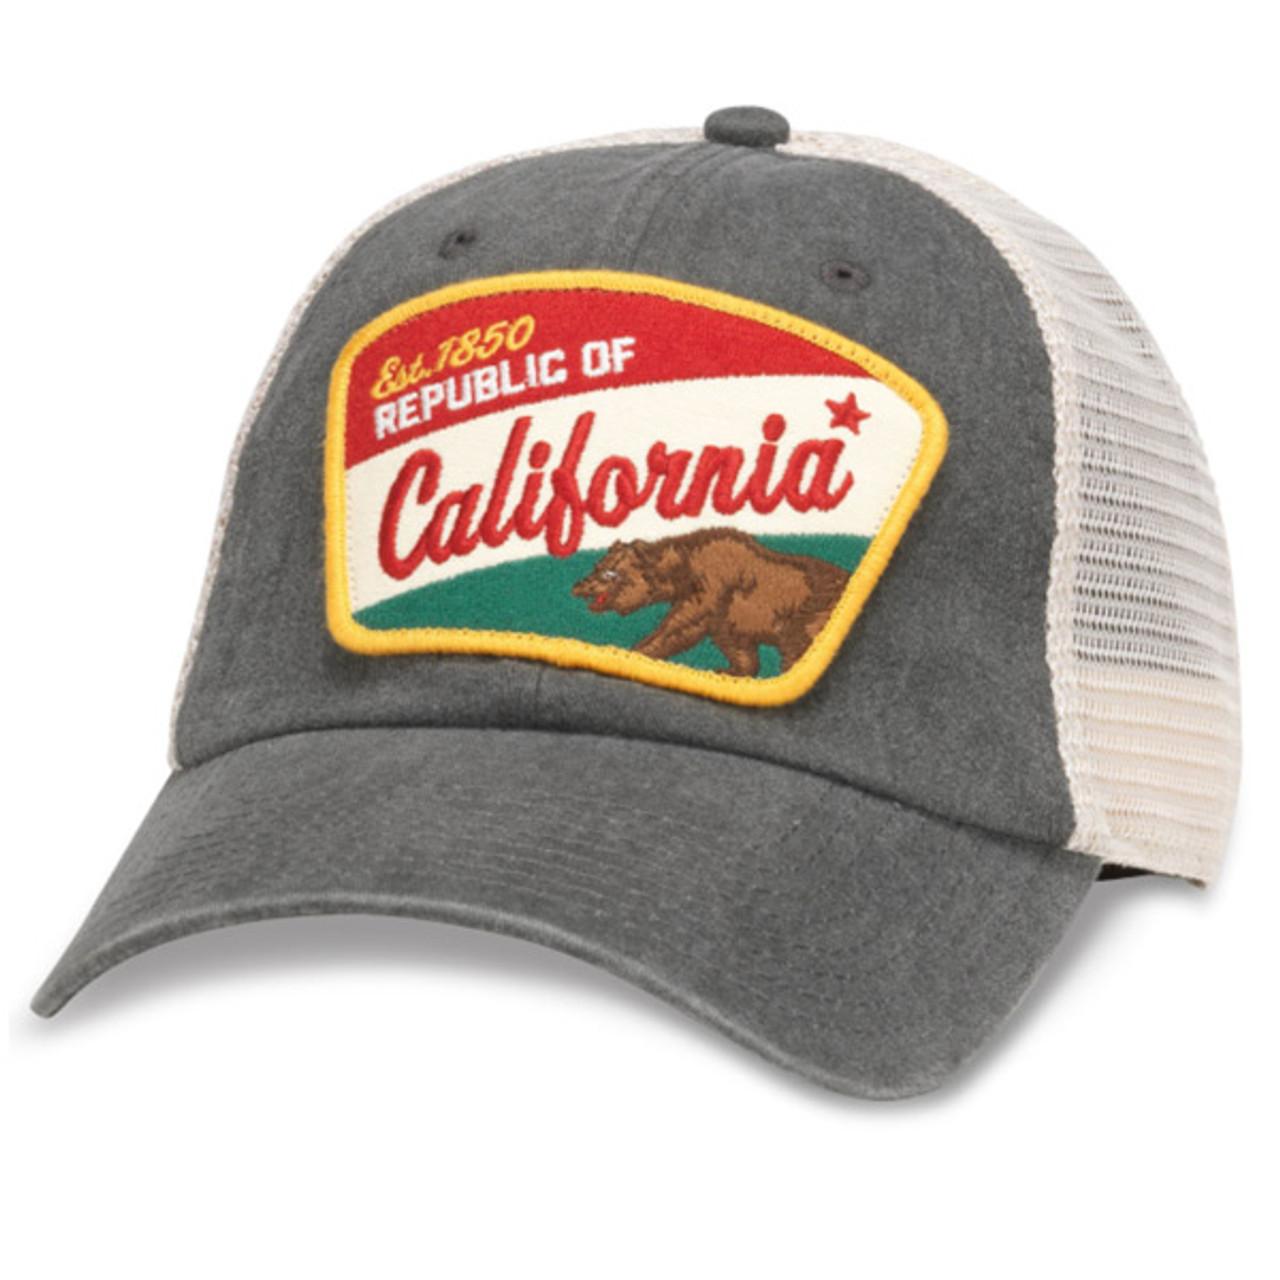 7e7ee2220de978 American Needle | Old School Cali Baseball Cap | Hats Unlimited